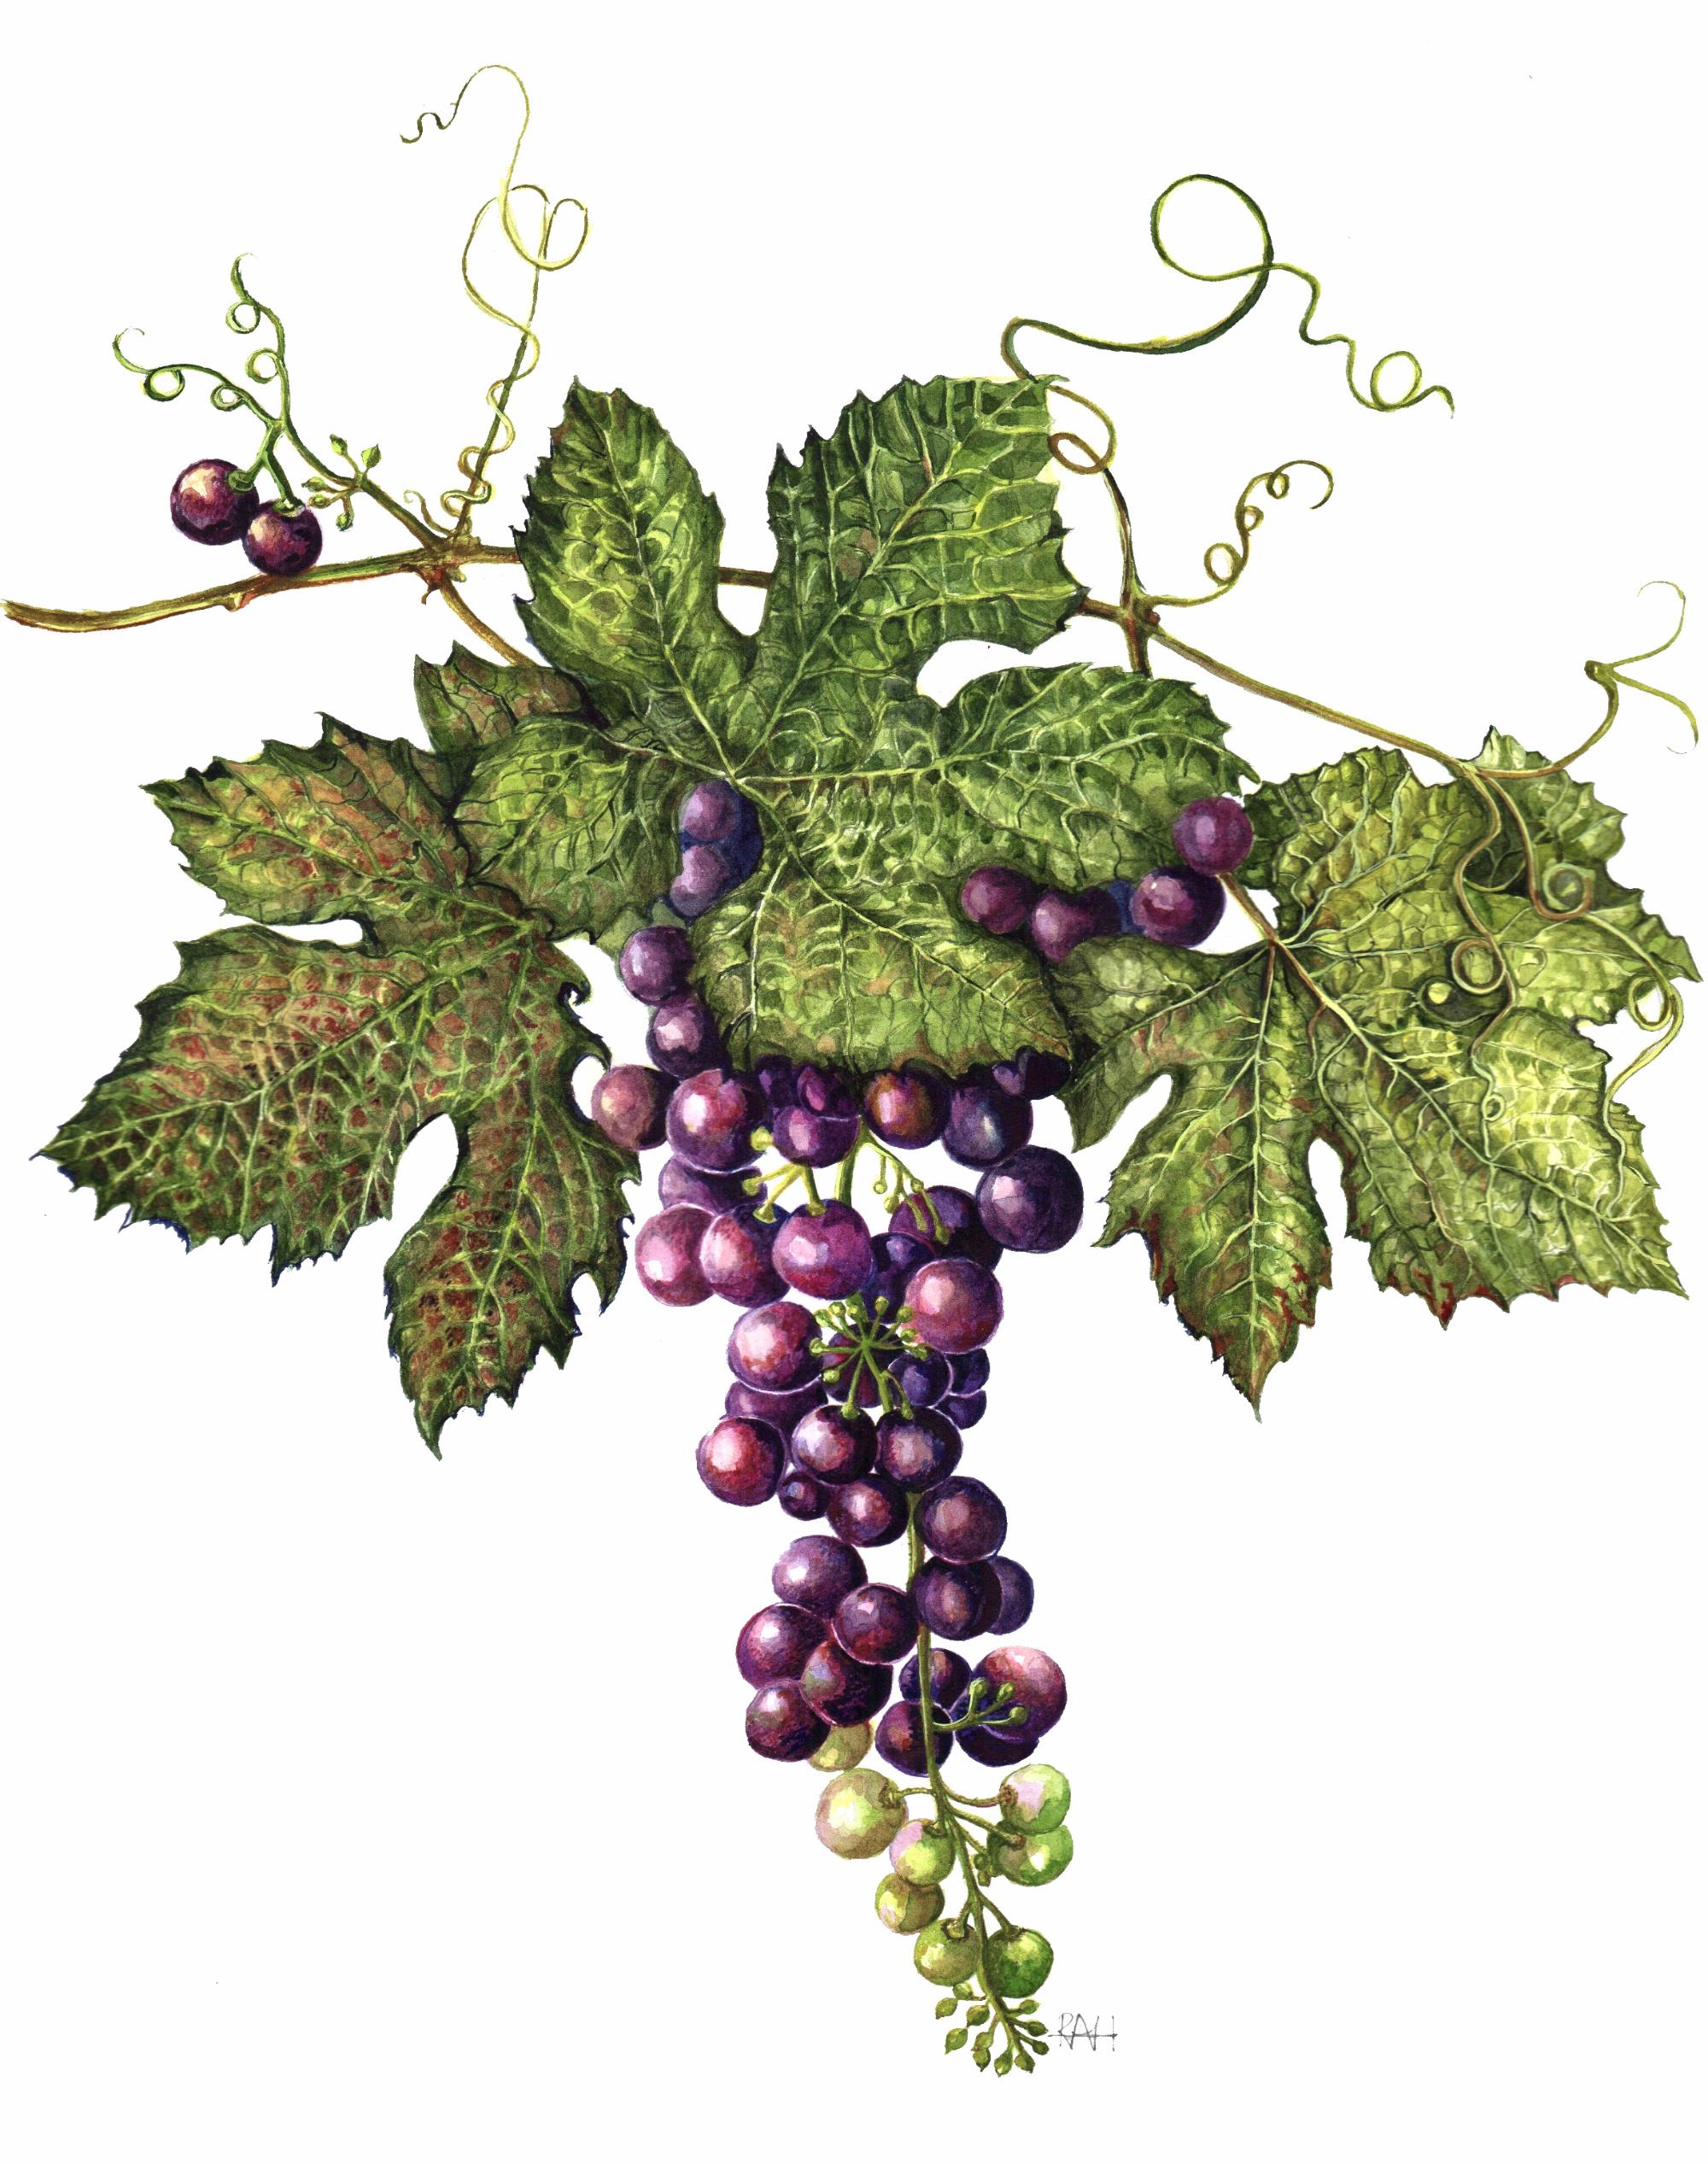 Ripening Grape Vine